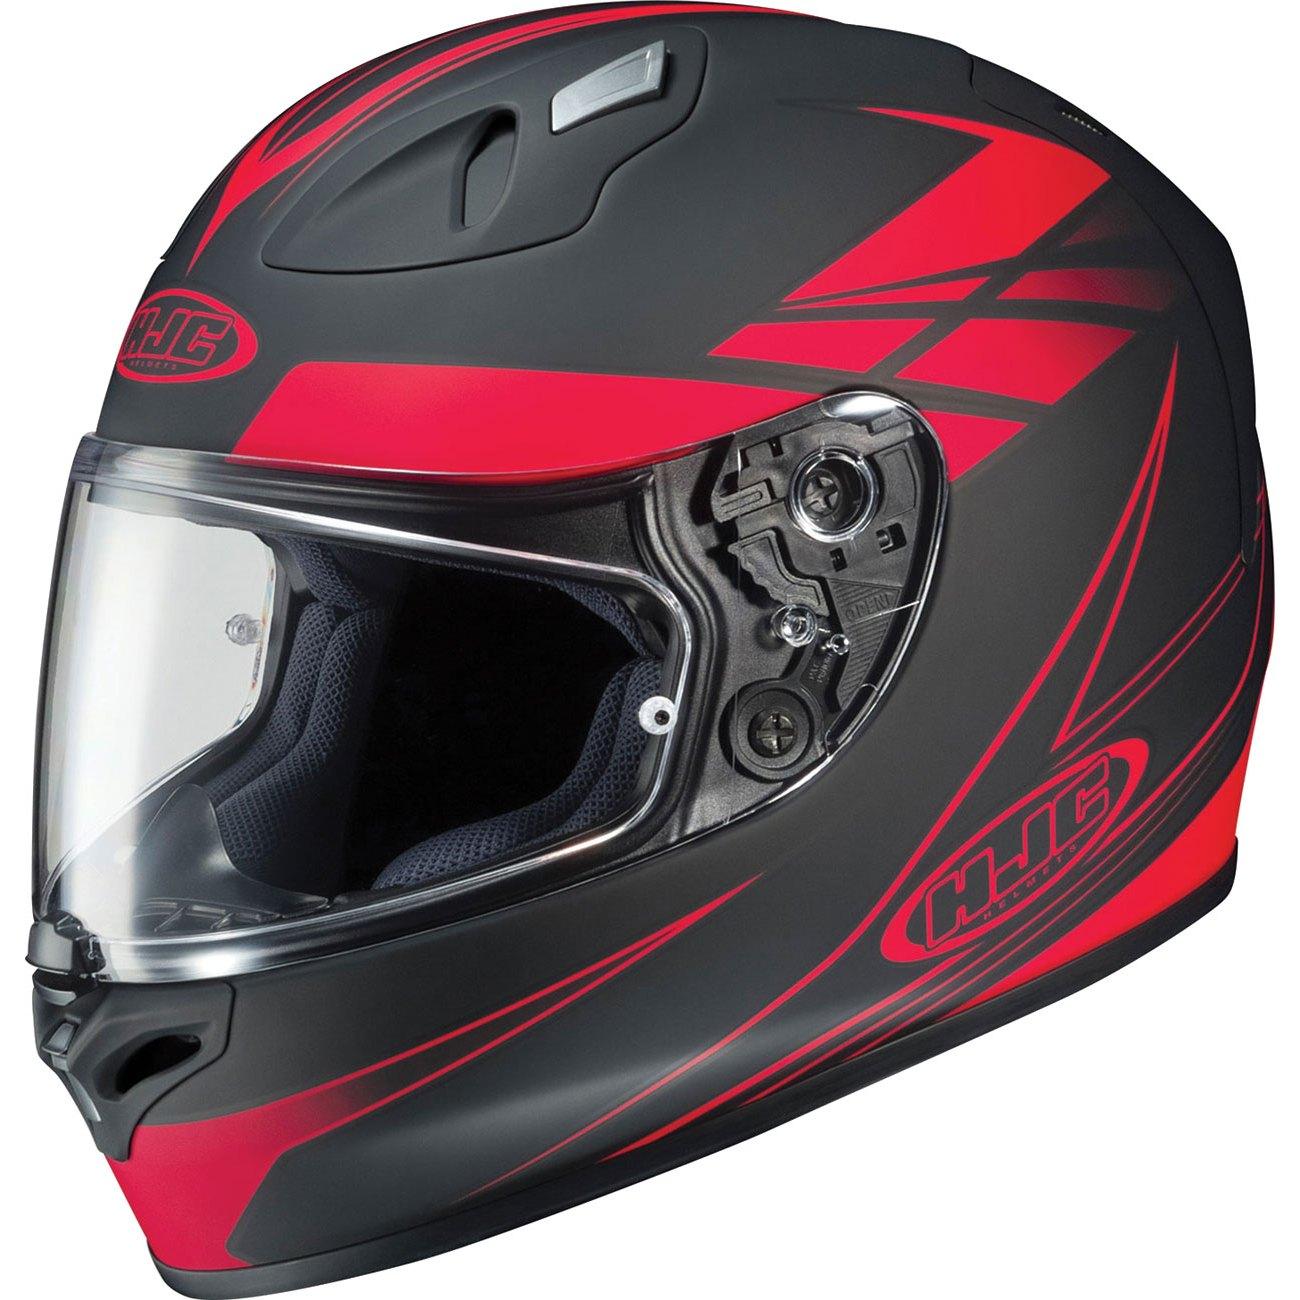 17 force mc 1 helmet full face street motorcycle flat matte black red